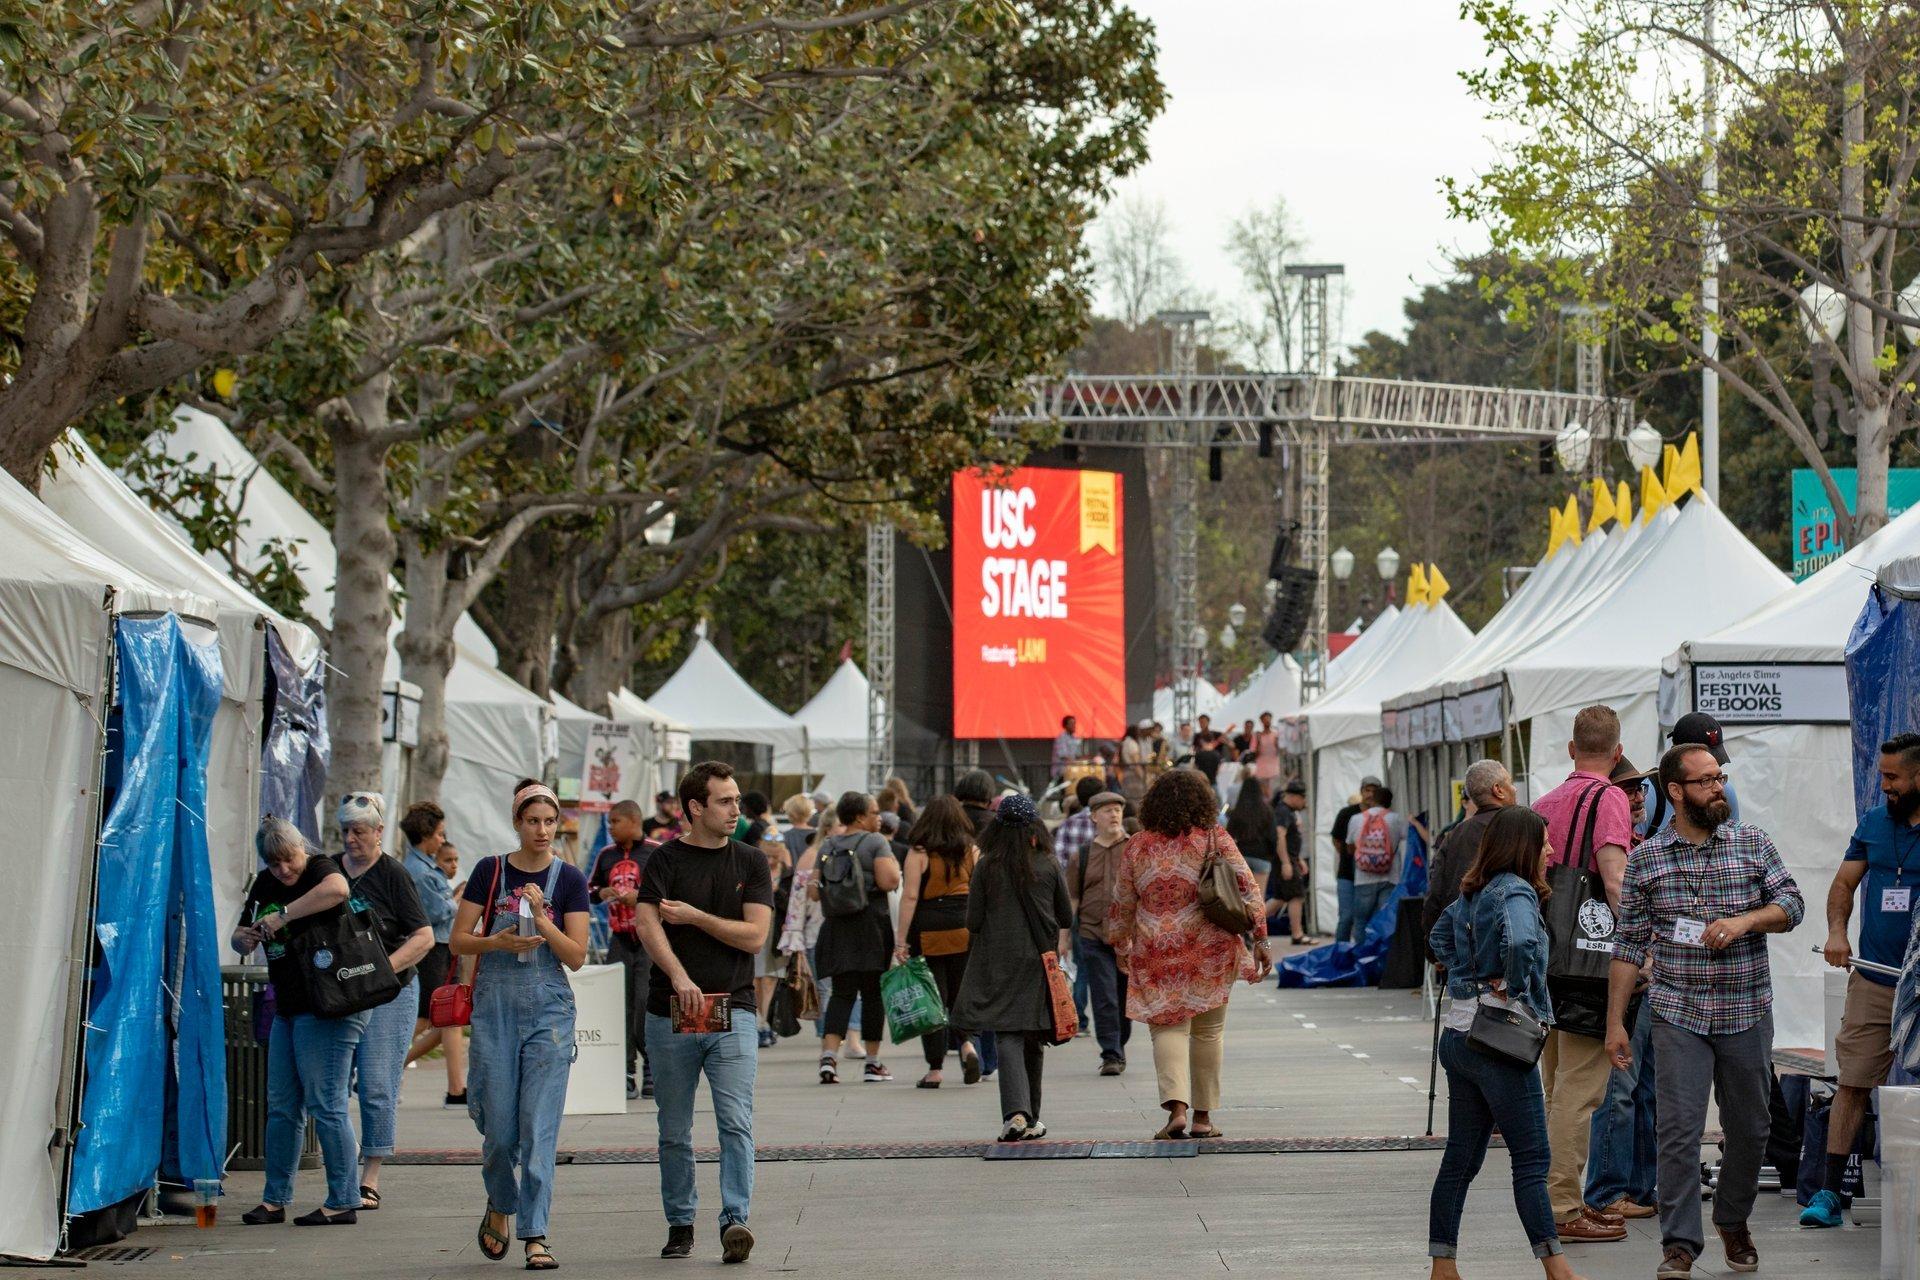 Los Angeles Times Festival of Books in Los Angeles - Best Season 2019